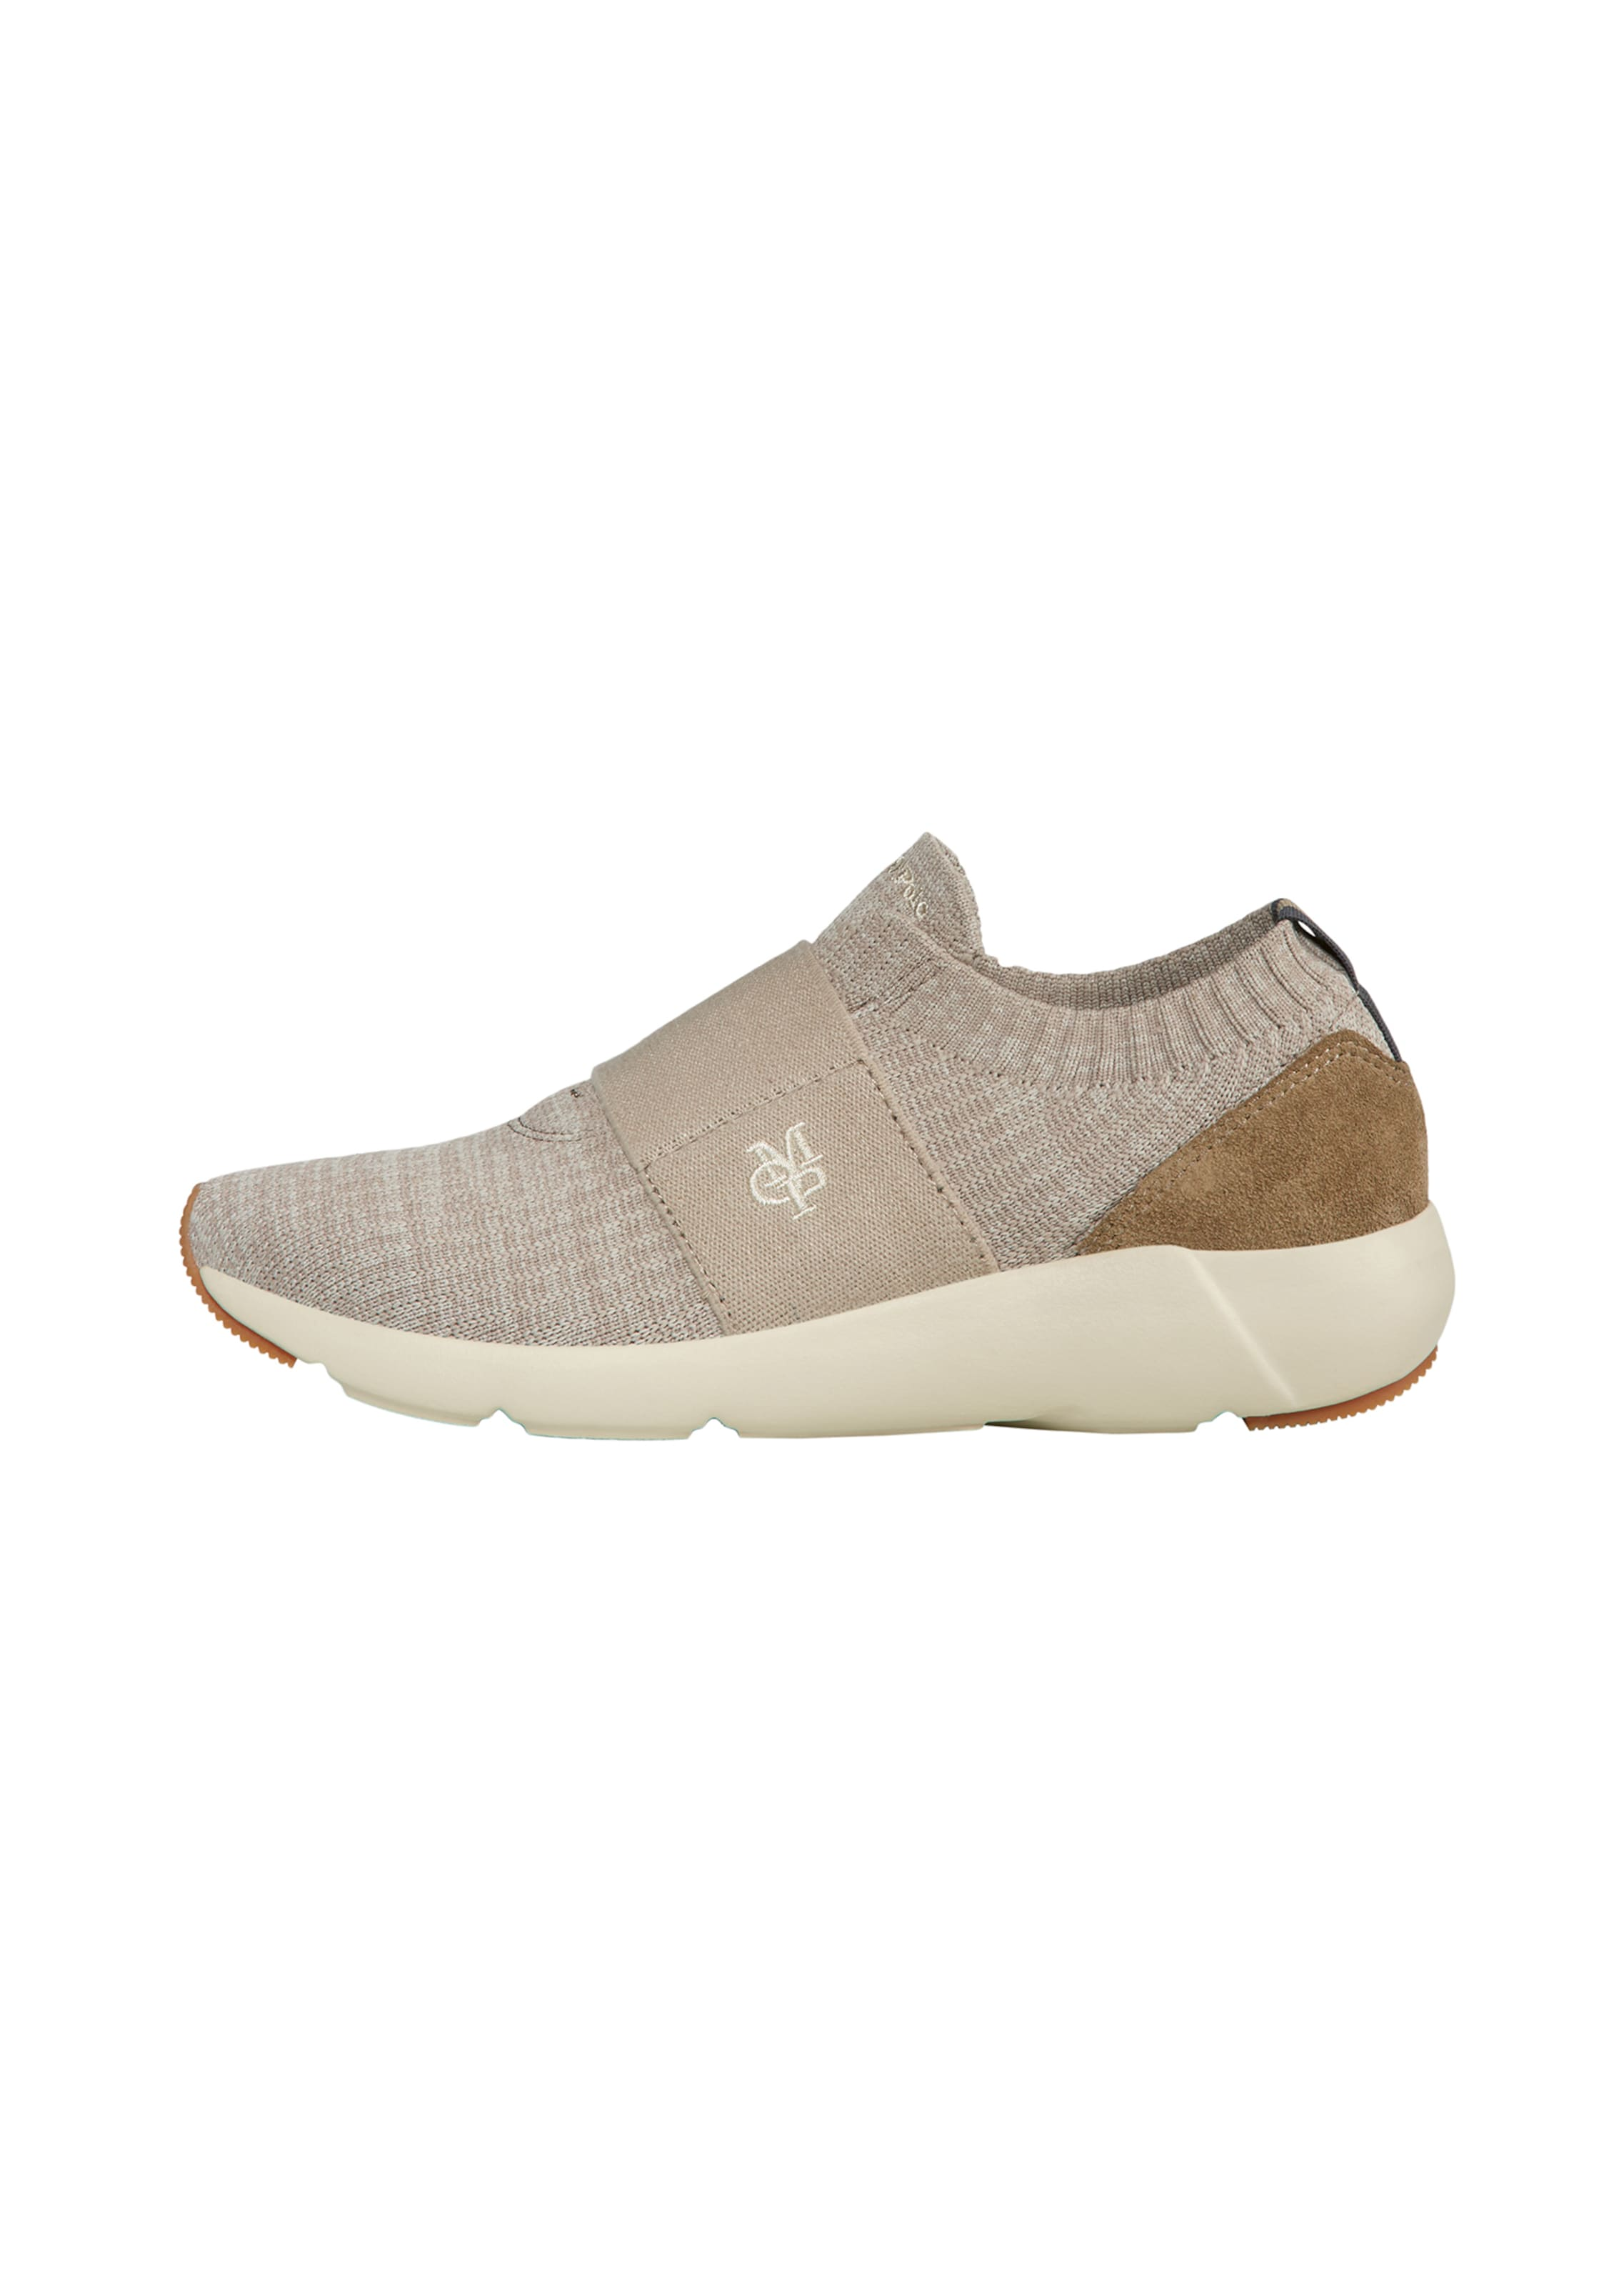 Haltbare Mode billige Schuhe Schuhe Marc O'Polo   Sneaker Schuhe Schuhe Gut getragene Schuhe bfaf35